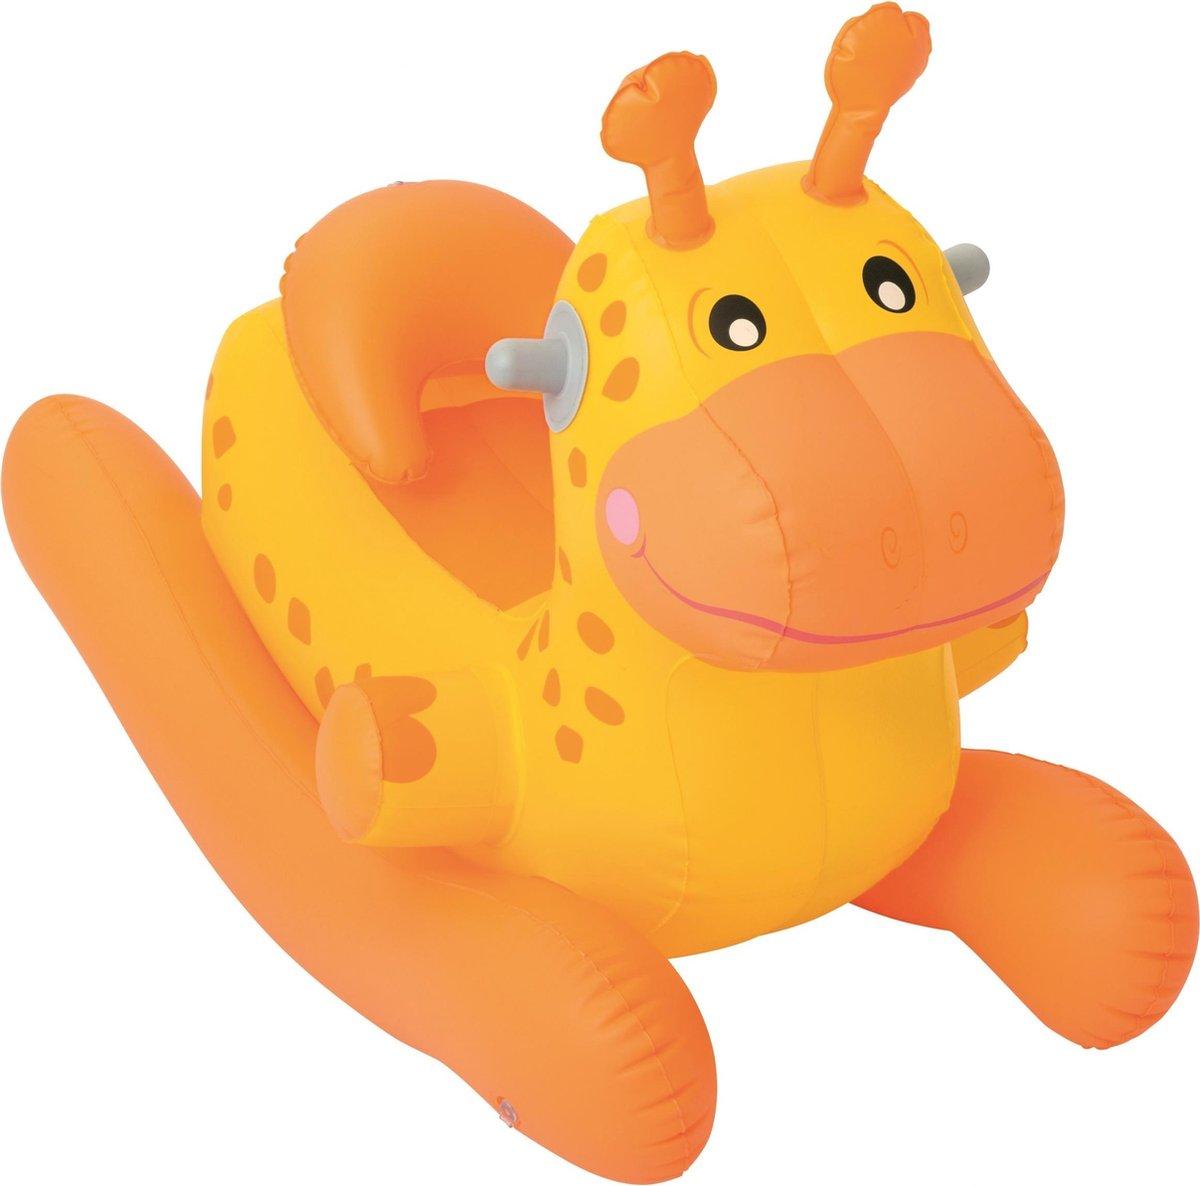 Bestway Opblaasdier Giraffe 74 X 43 X 63 Cm Oranje